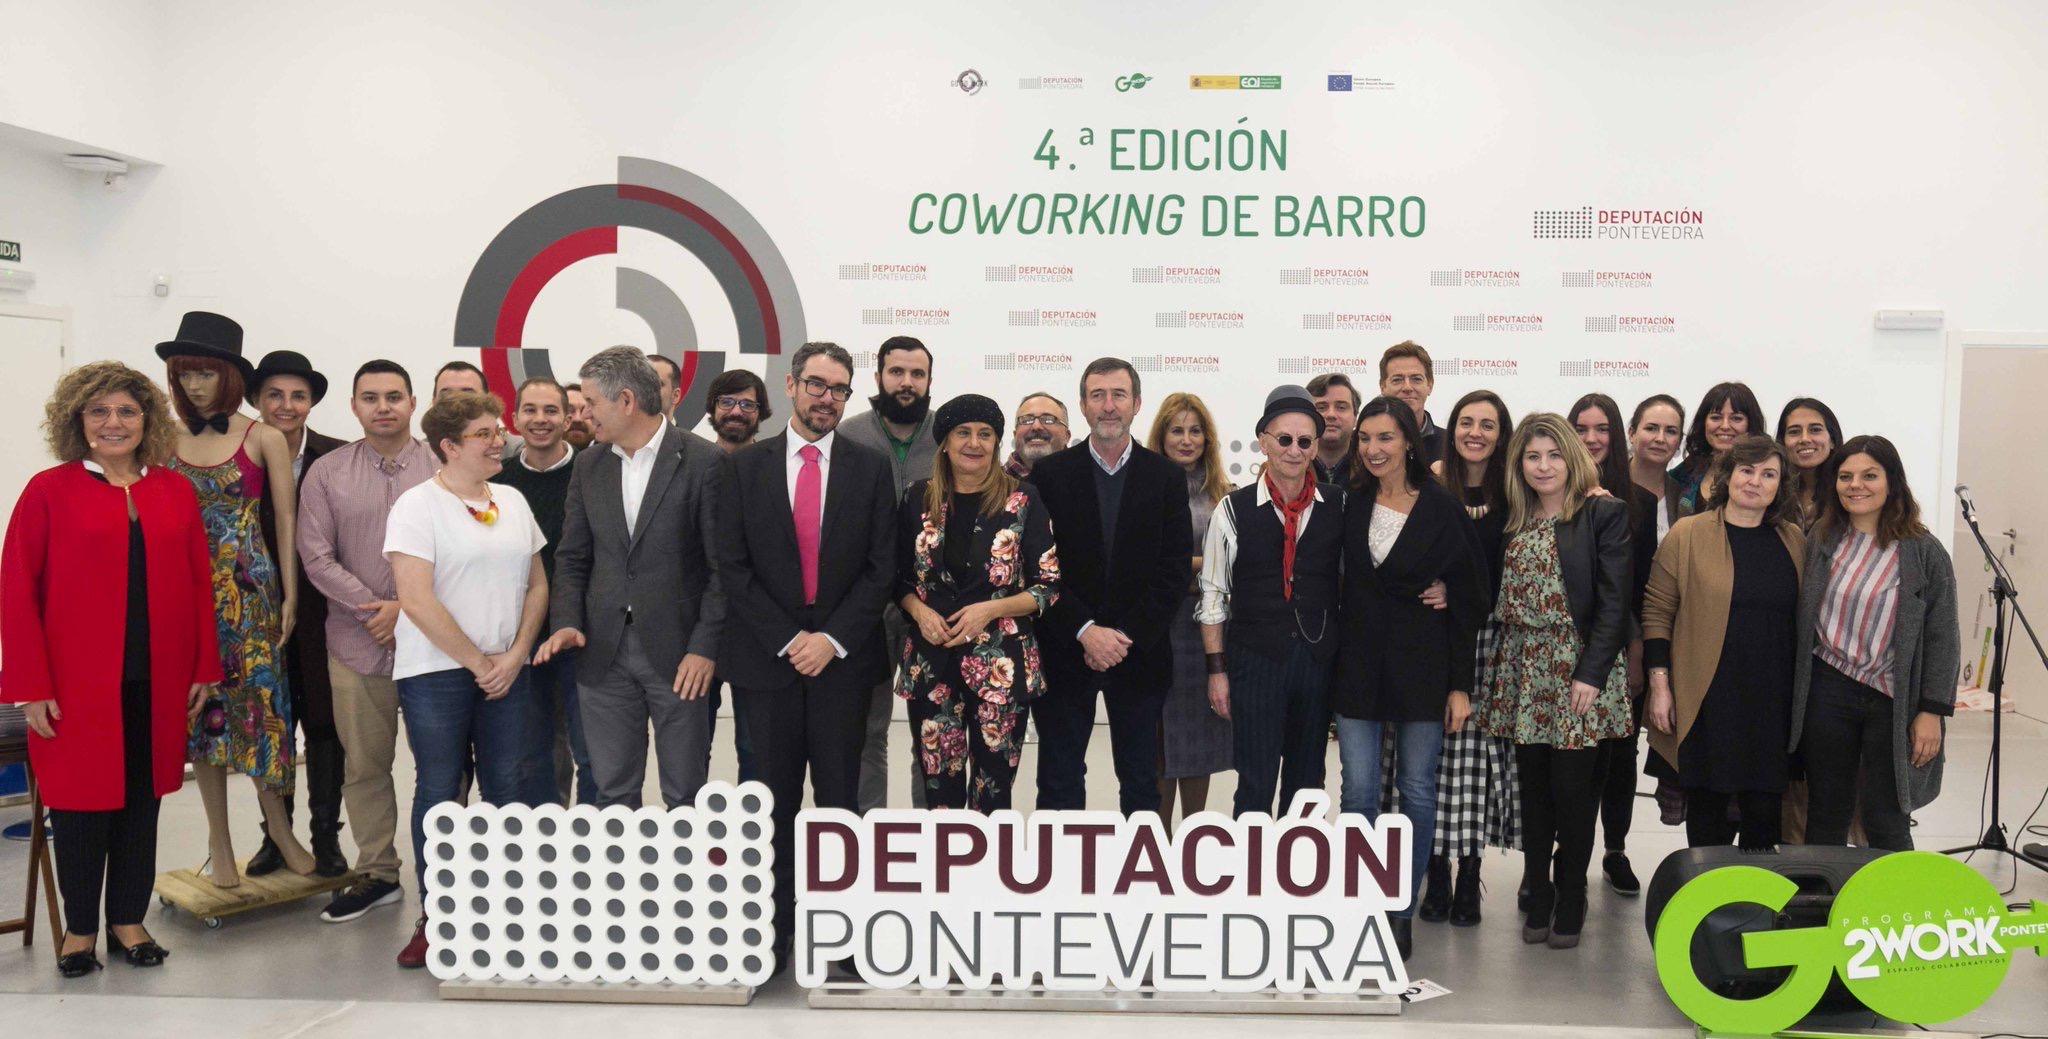 Coworking EOI - Deputacion Pontevedra - Barro-Meis-4ª Edicion